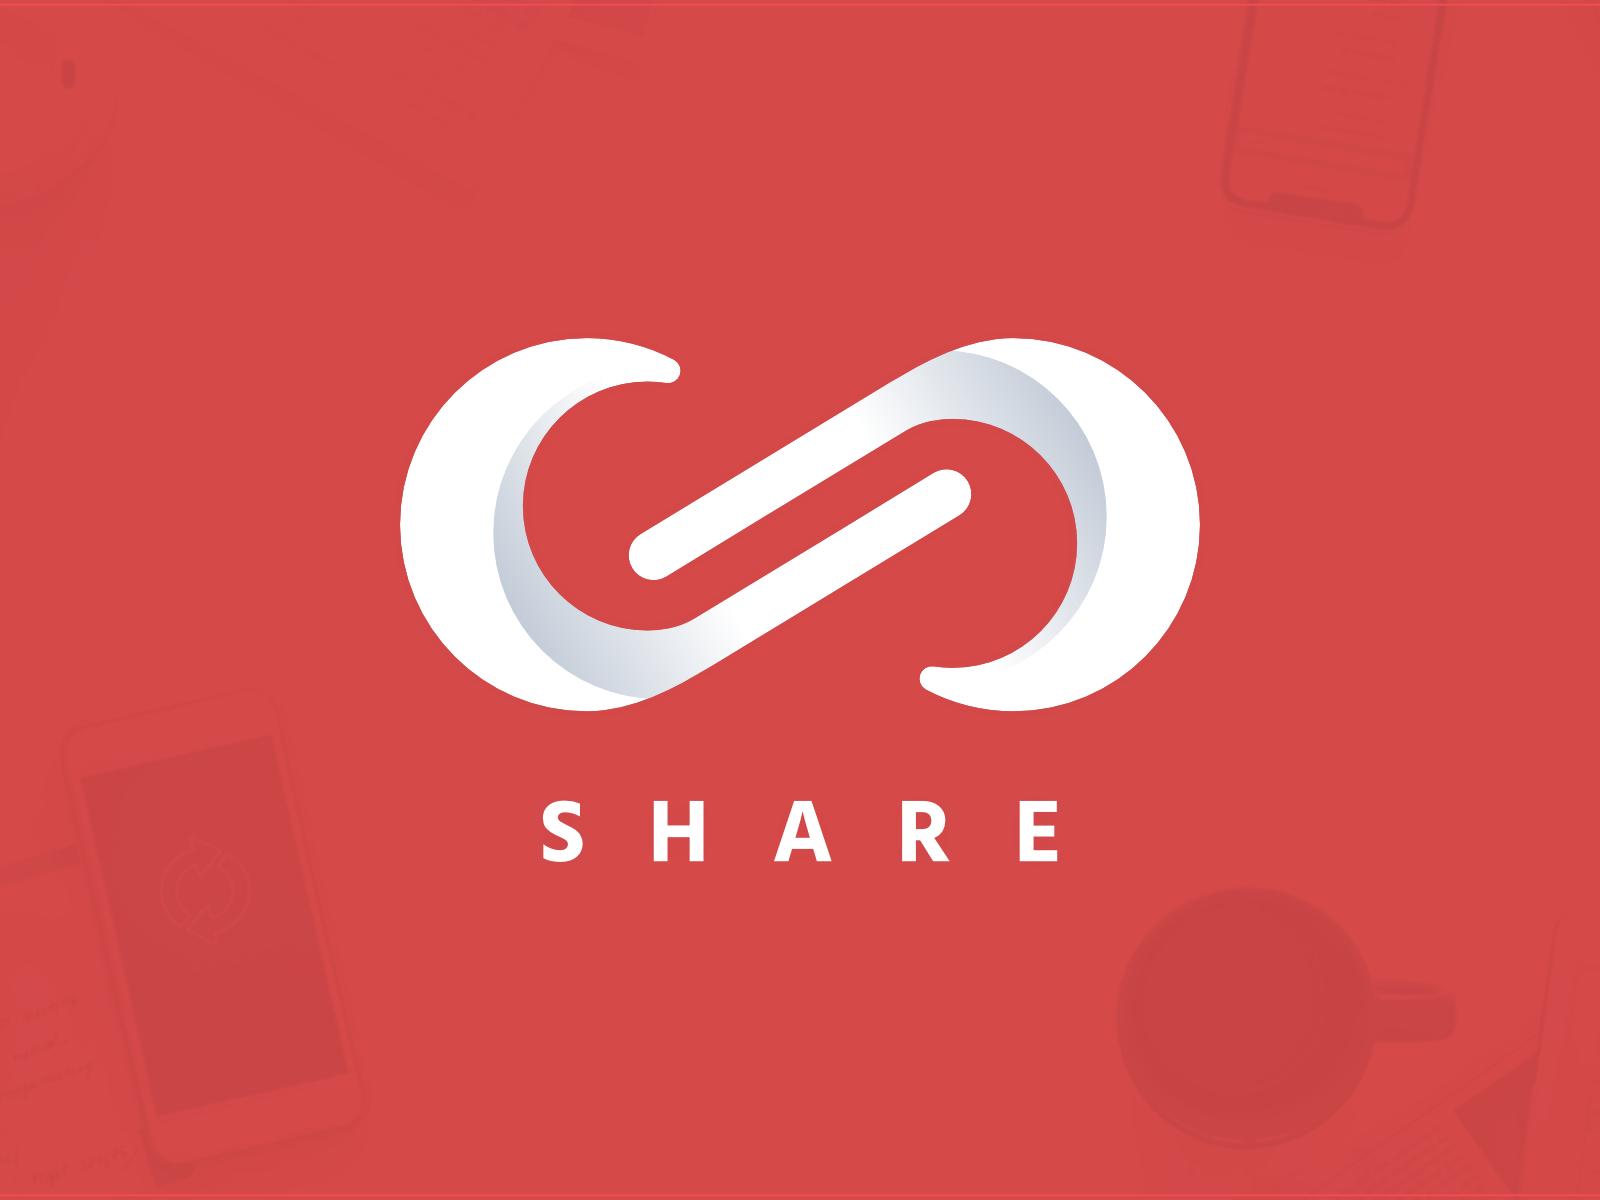 31. share 2x